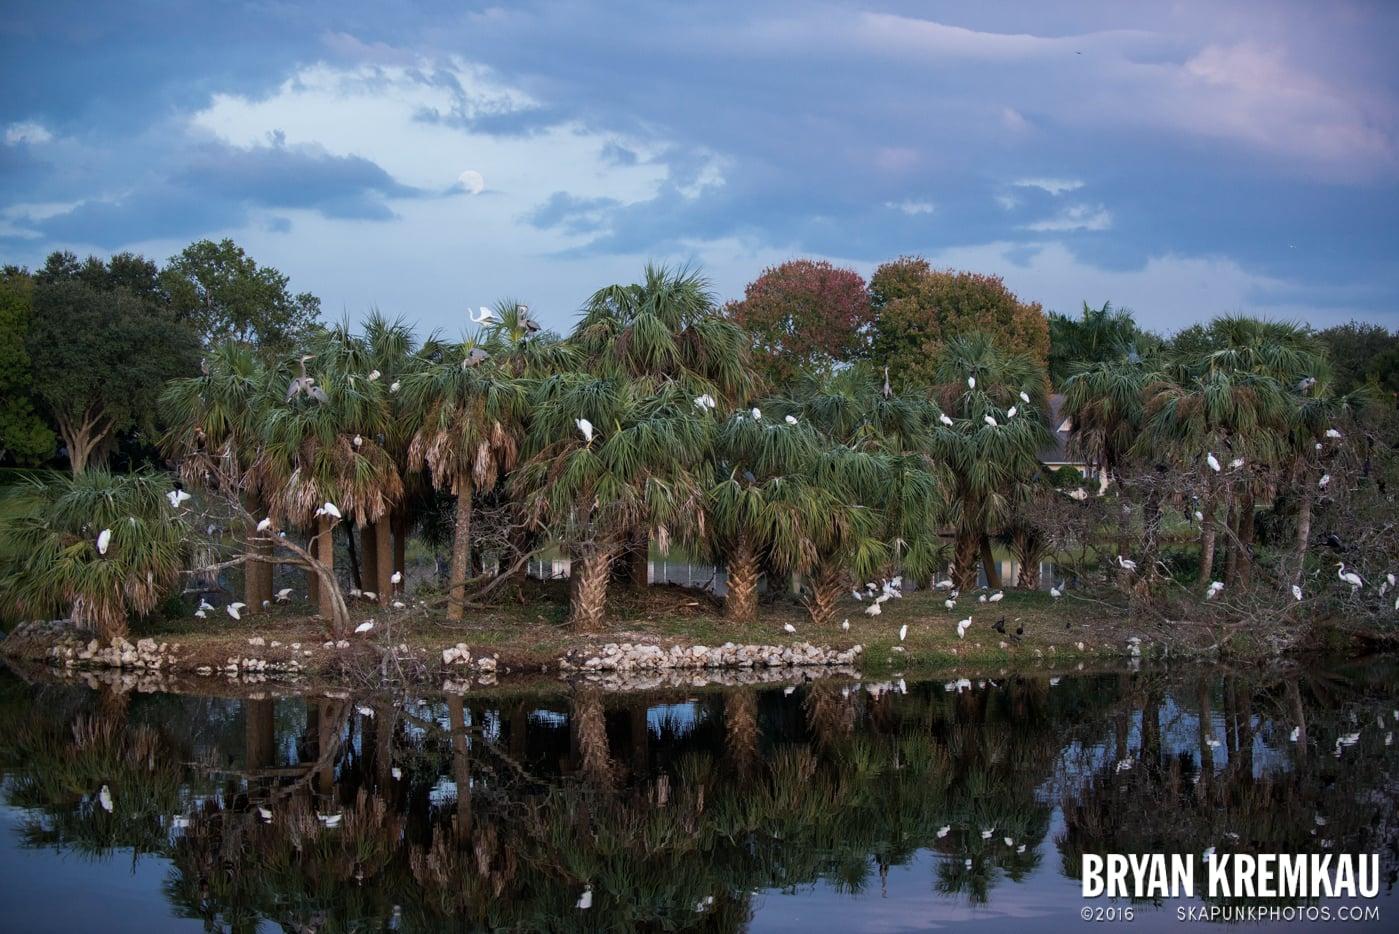 Sunsets, Astrophotography & Birds @ Venice, Florida - 10.25.14 - 11.5.14 (22)